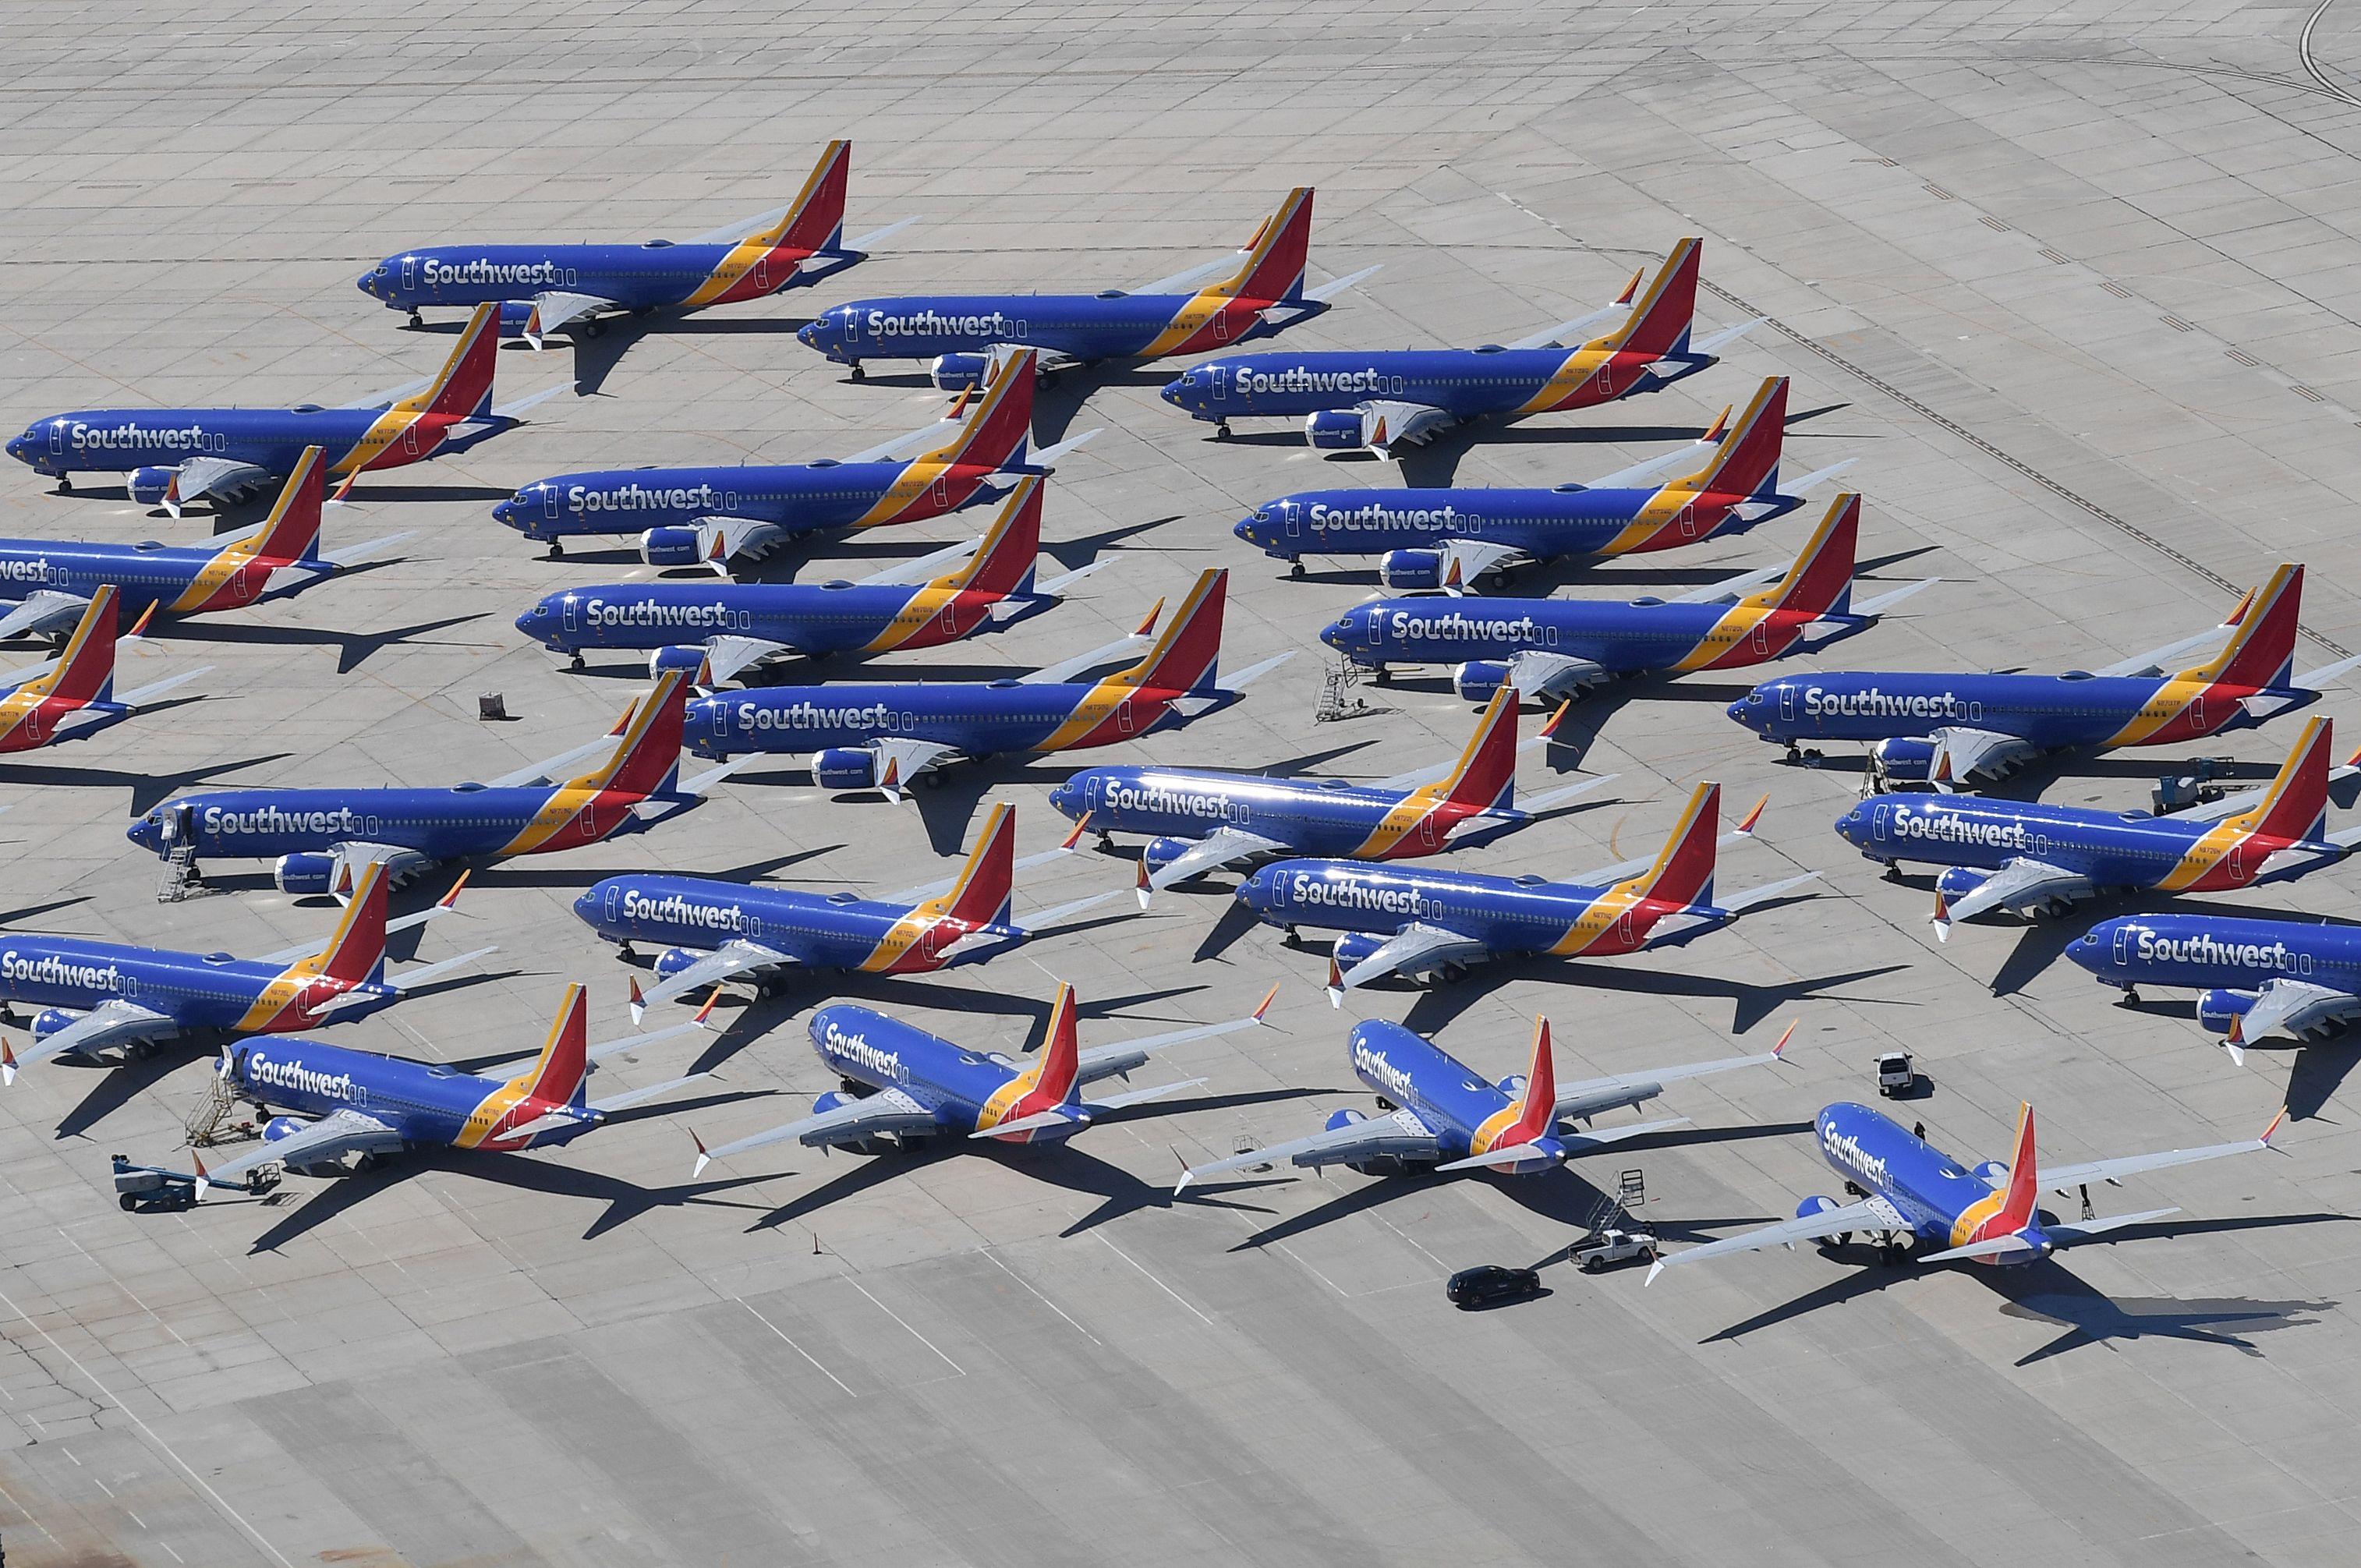 Resultado de imagen para Southwest Airlines Boeing 737 MAX grounded